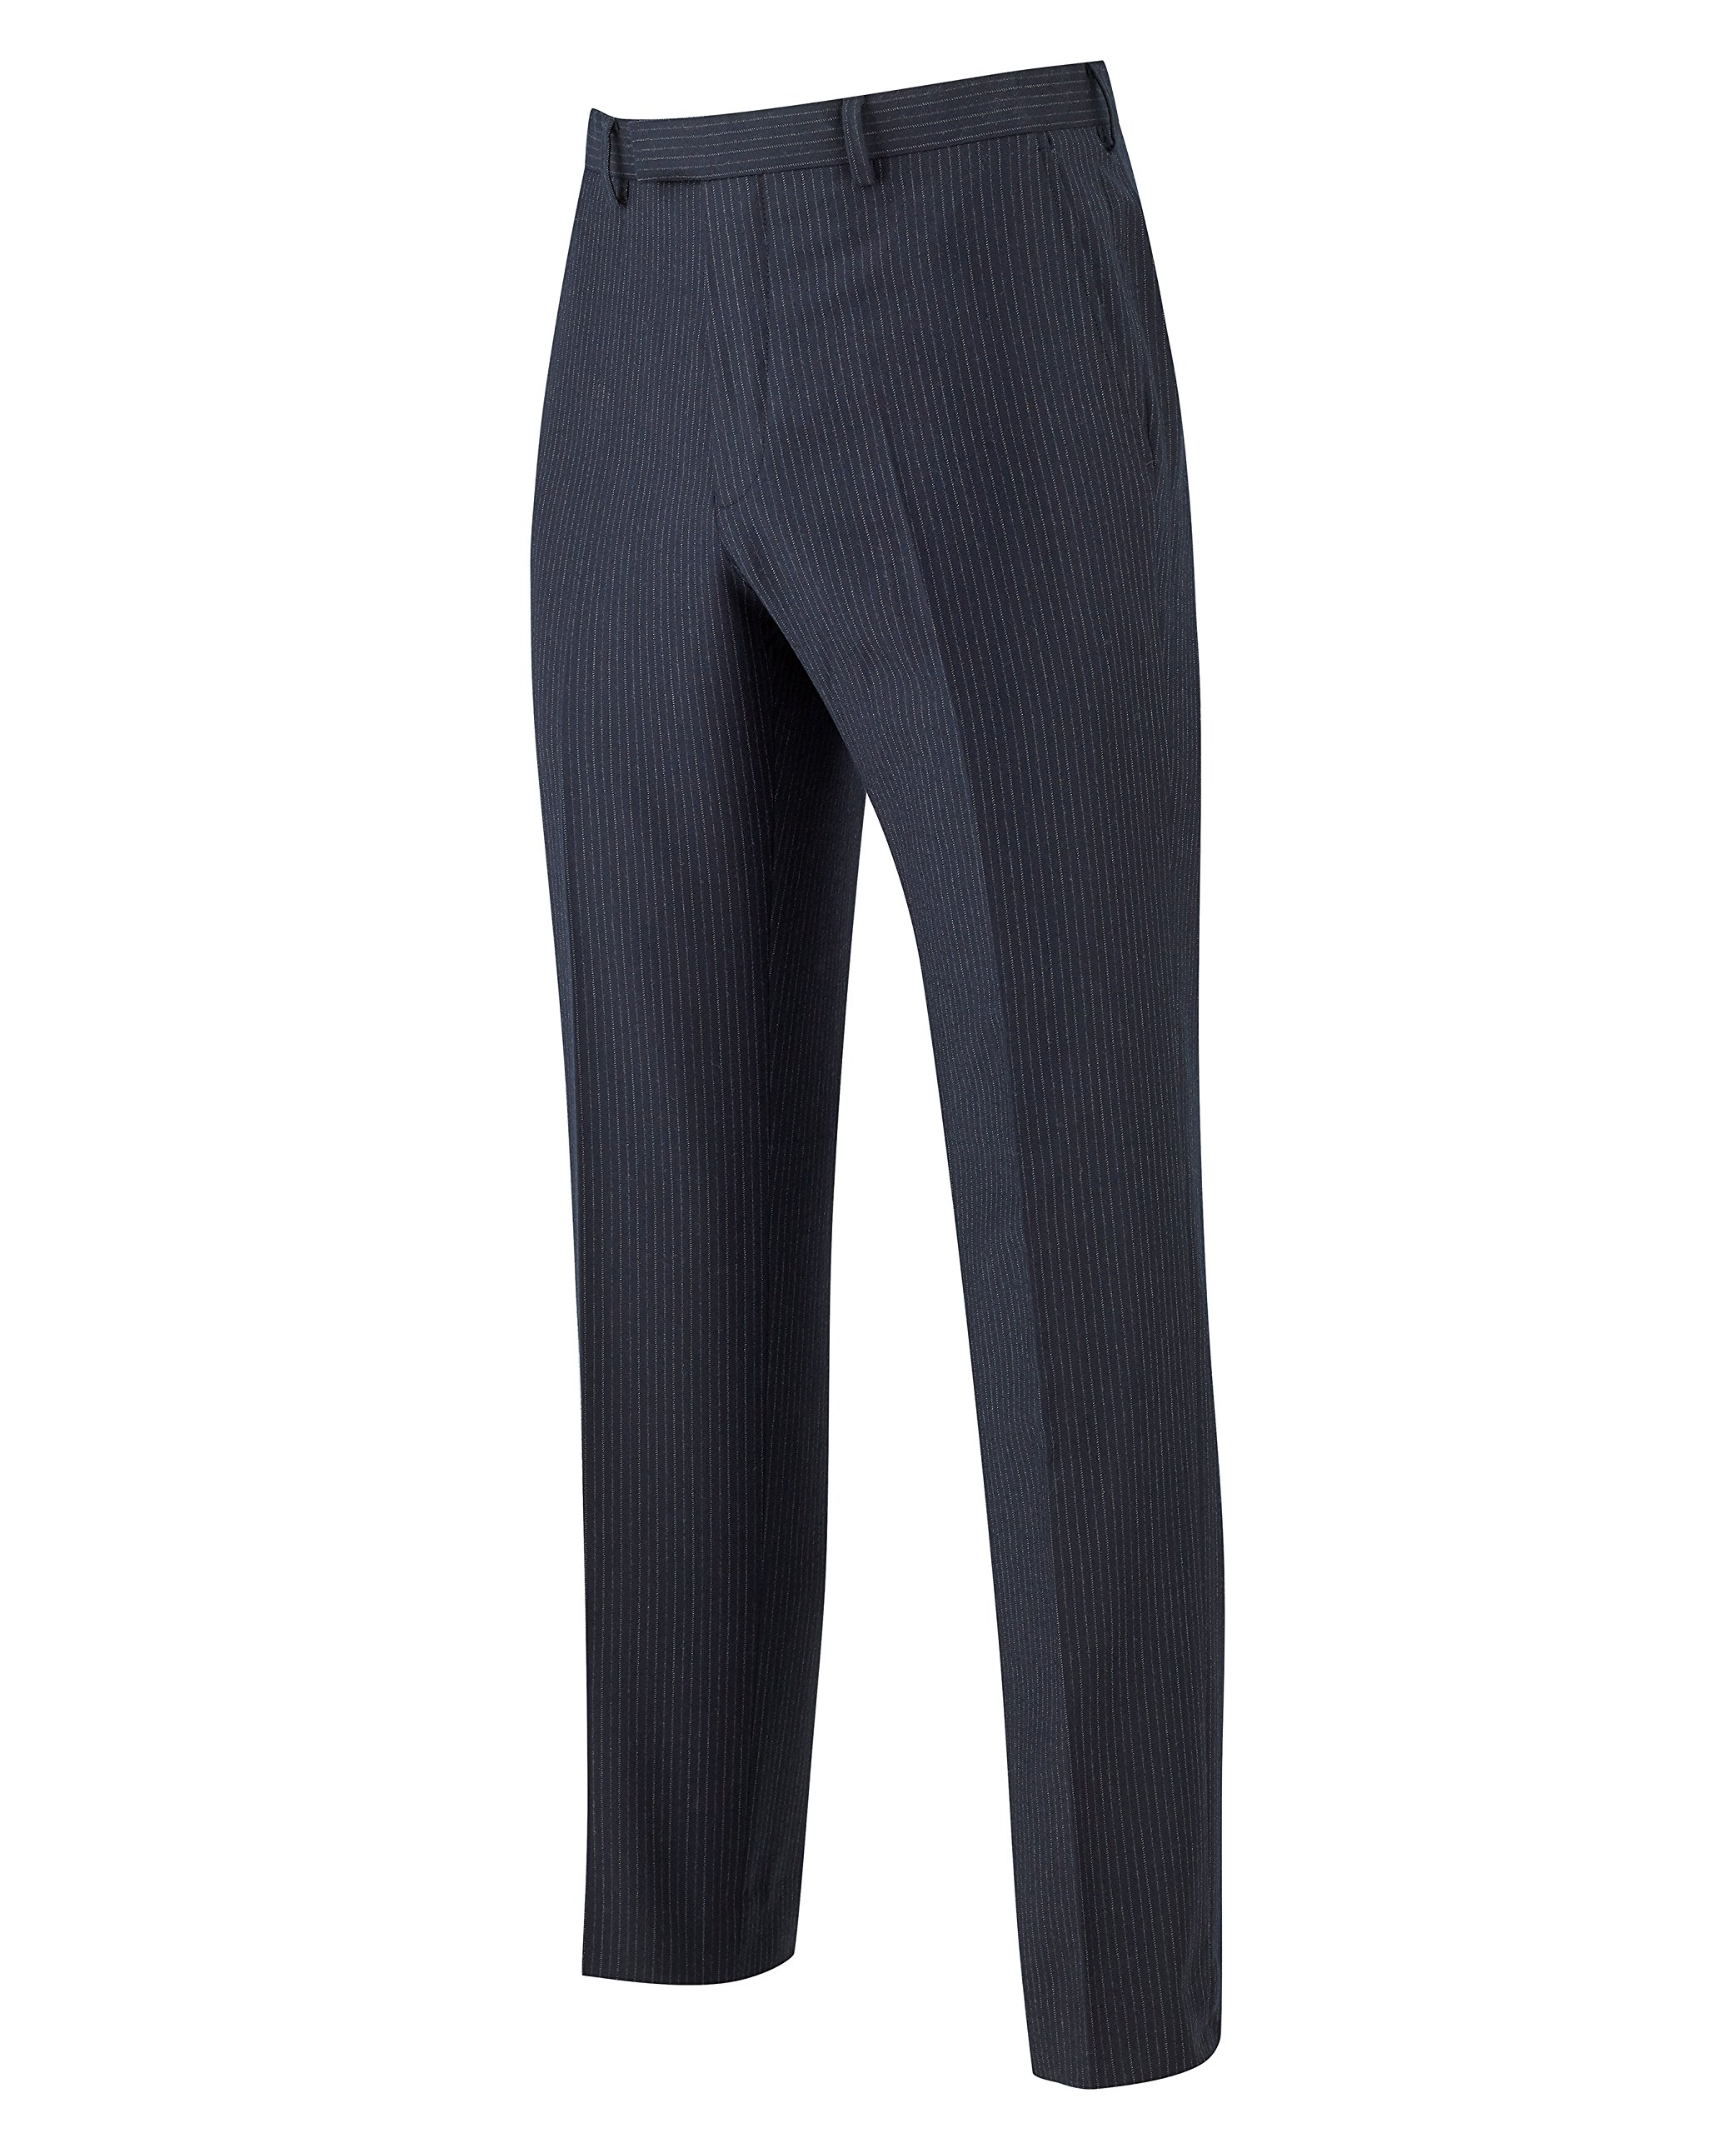 The Savile Row Company Savile Row Men's Navy Pinstripe Business Suit Trousers 34'' 32''